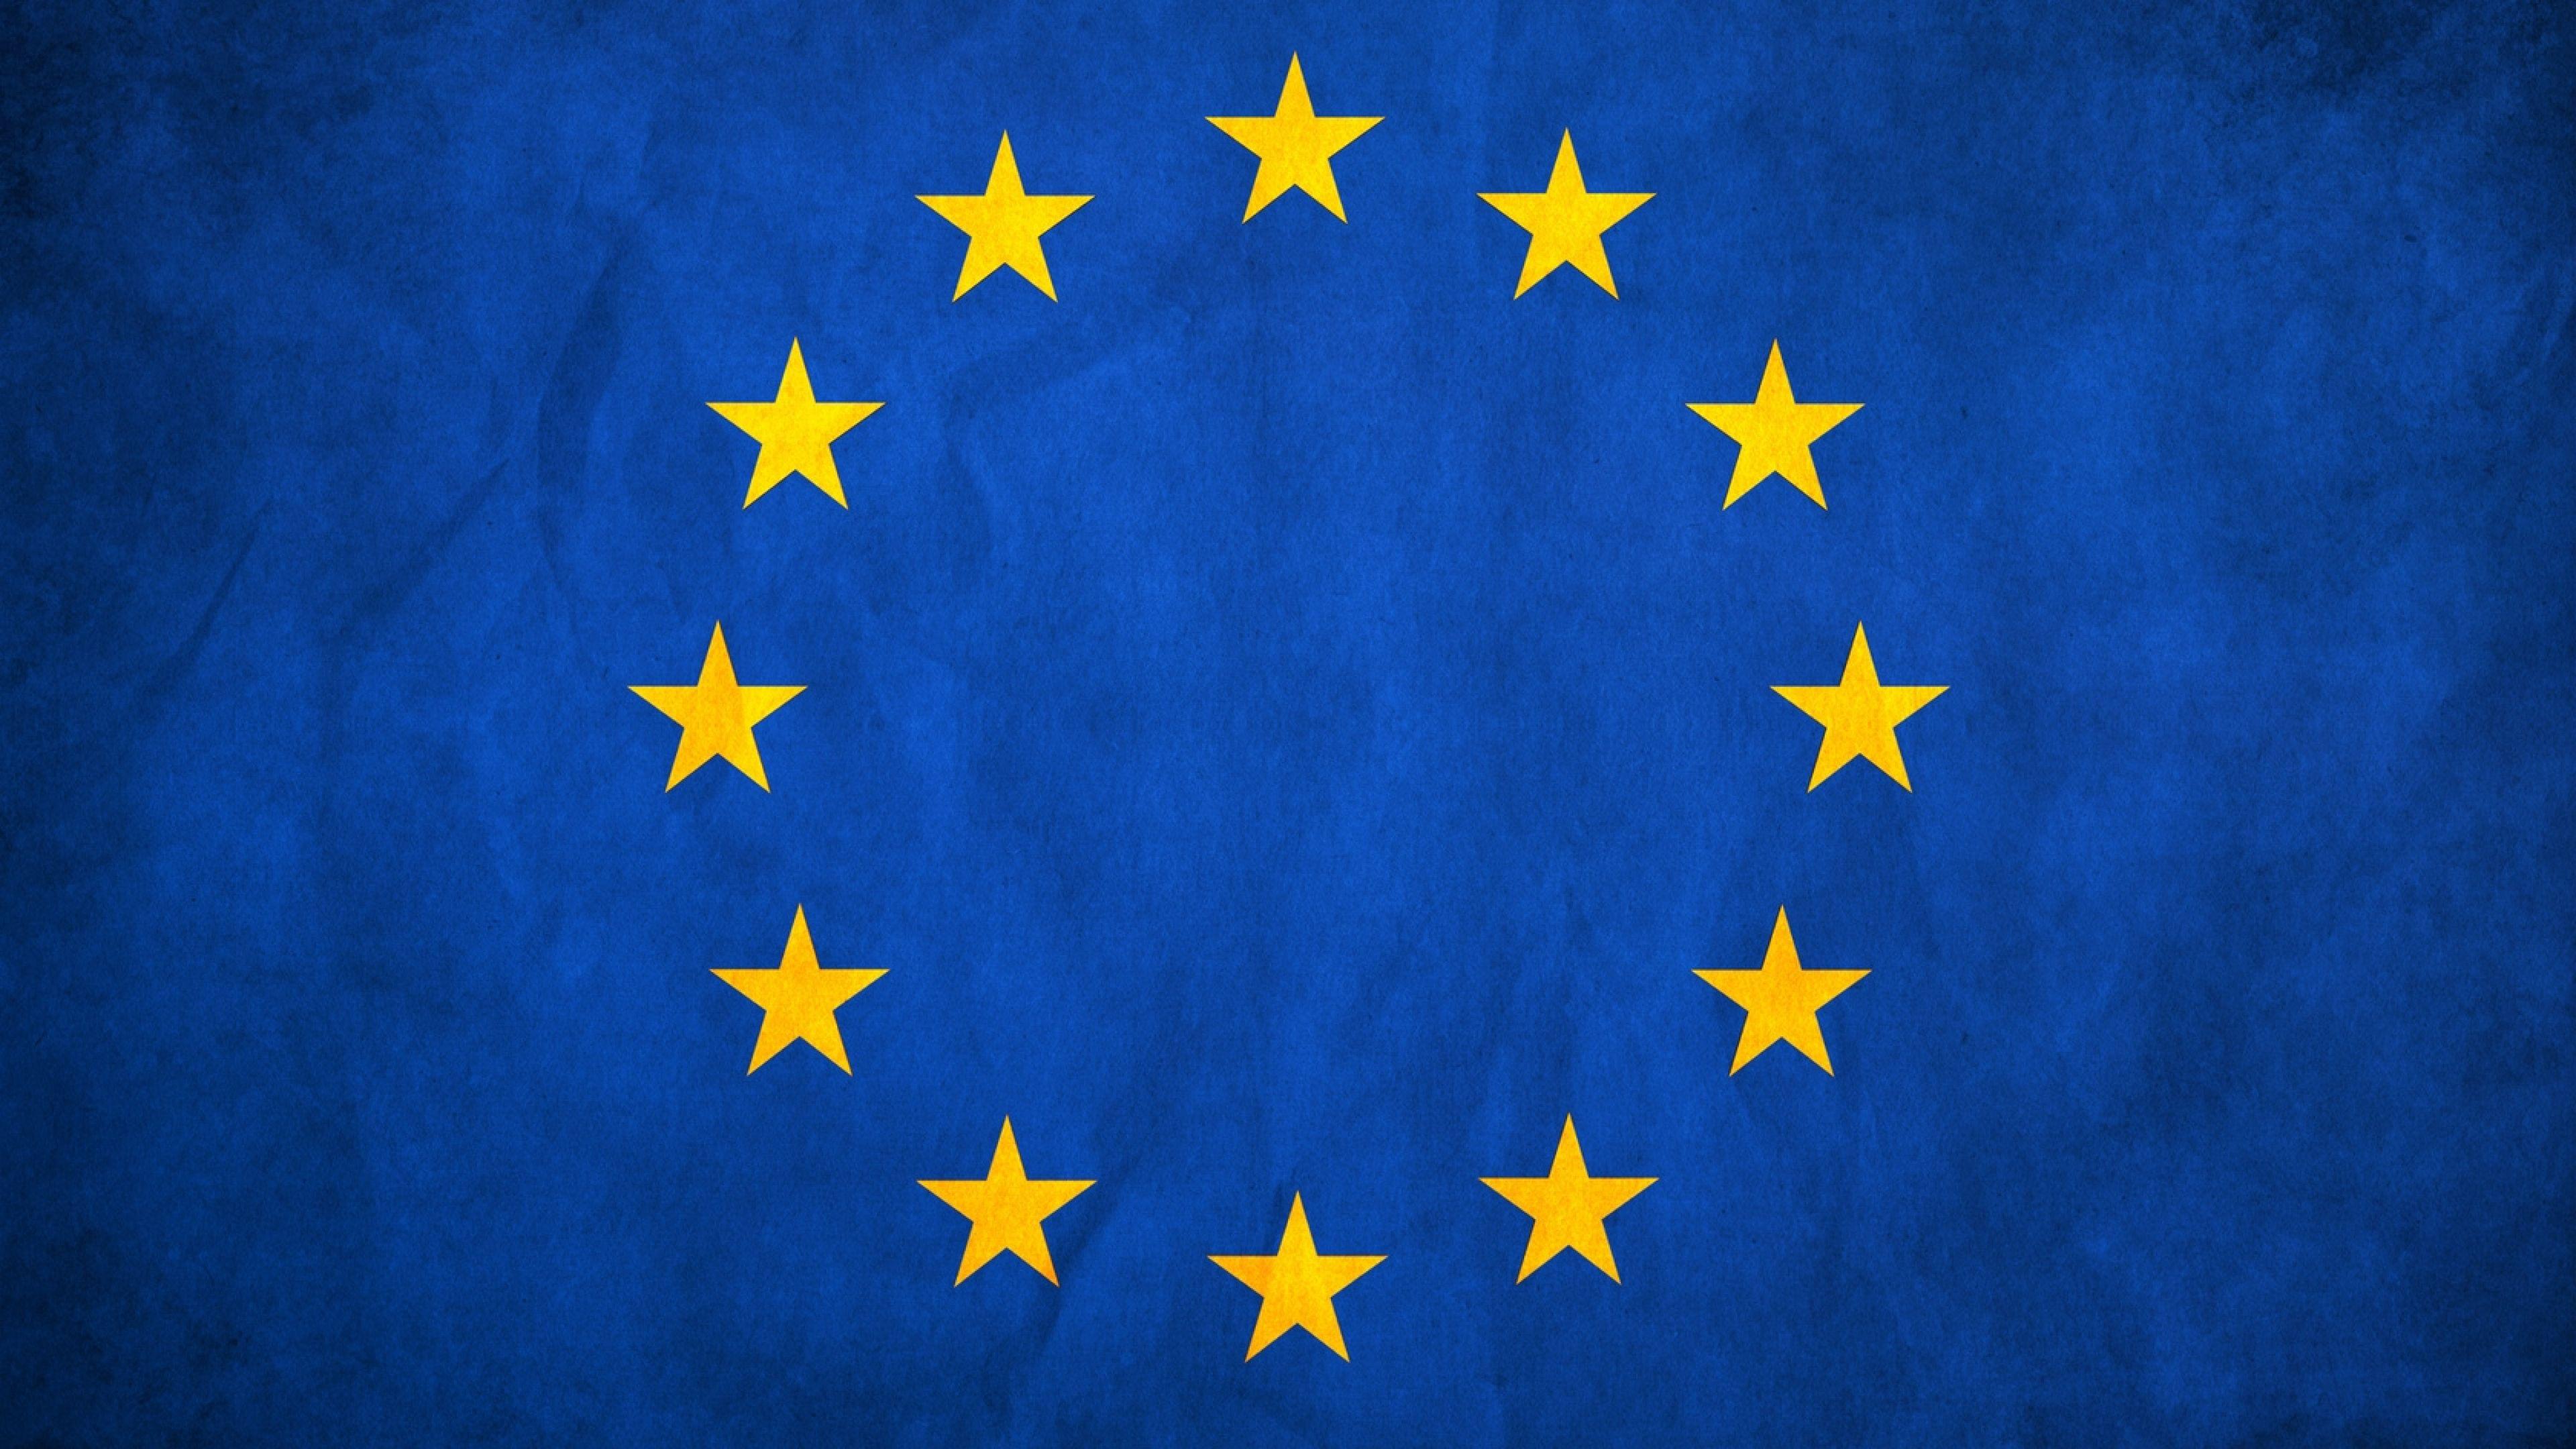 European Union Flag Stars Europe Texture 4k Hd 3840x2160